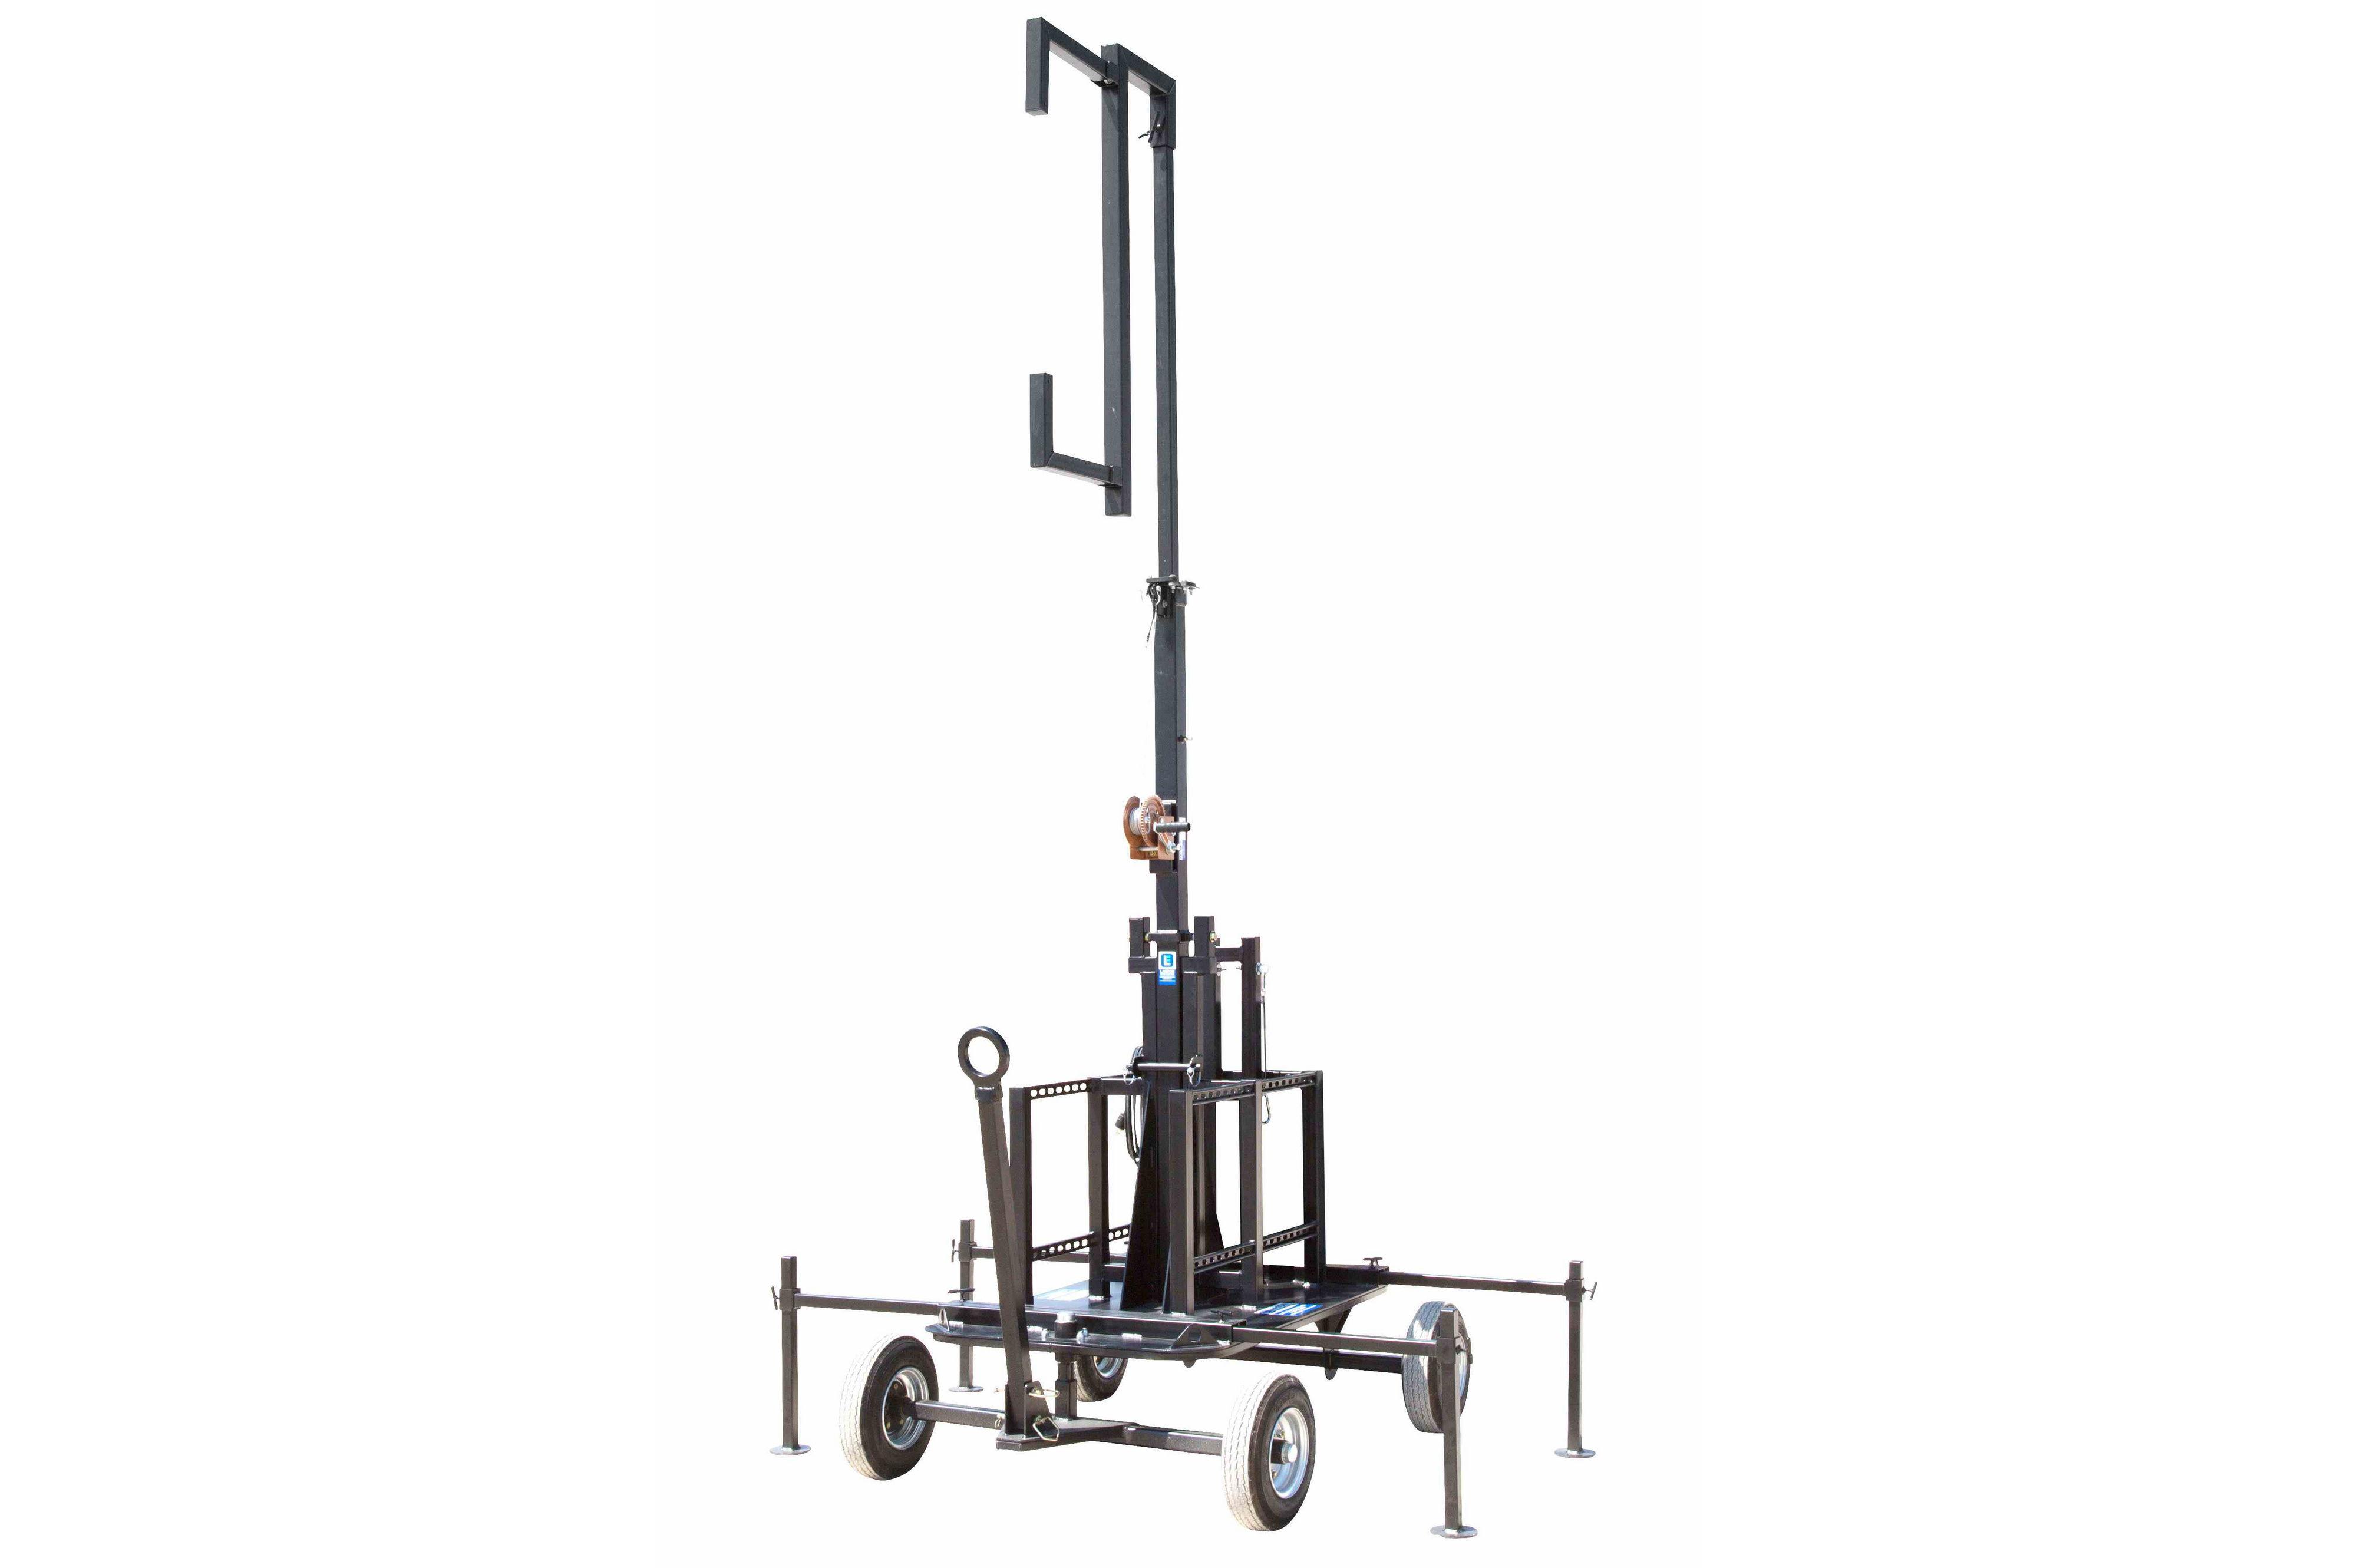 Crank Up Mini Antenna Tower - Wheeled Cart Base - 7'-12' Light Mast - Mount  Antennas and Amplifiers